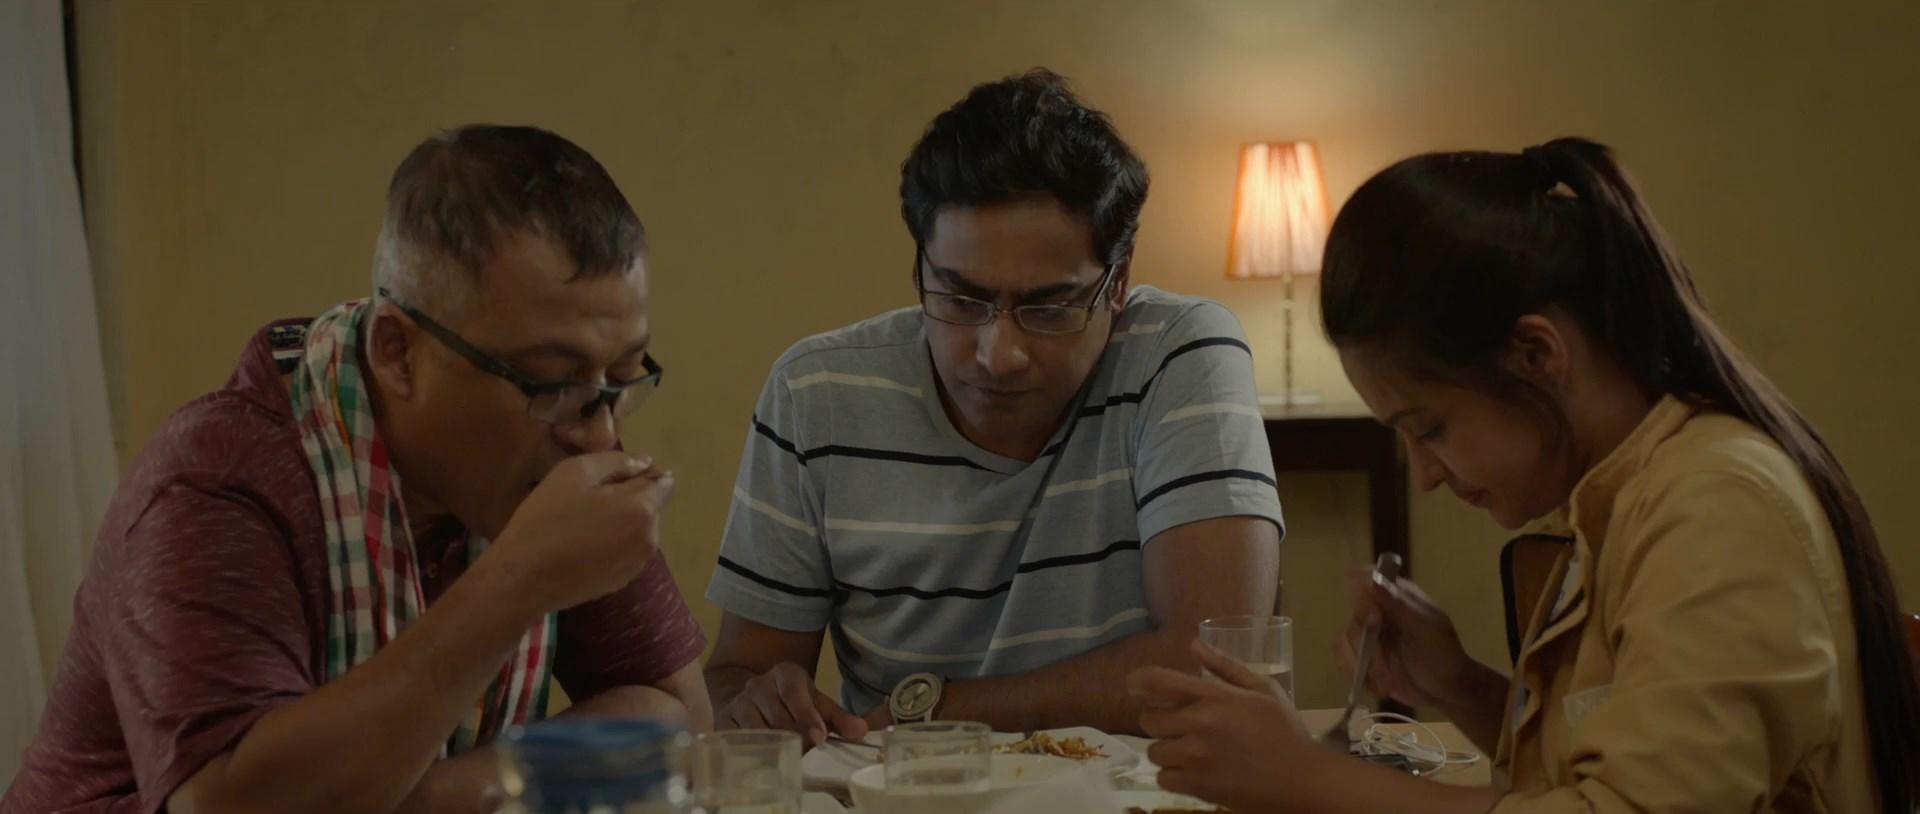 KAYA The Mystery Unfolds 2021 Bengali Movie 1080p WEB DL x264 AAC.mp4 snapshot 00.47.01.208